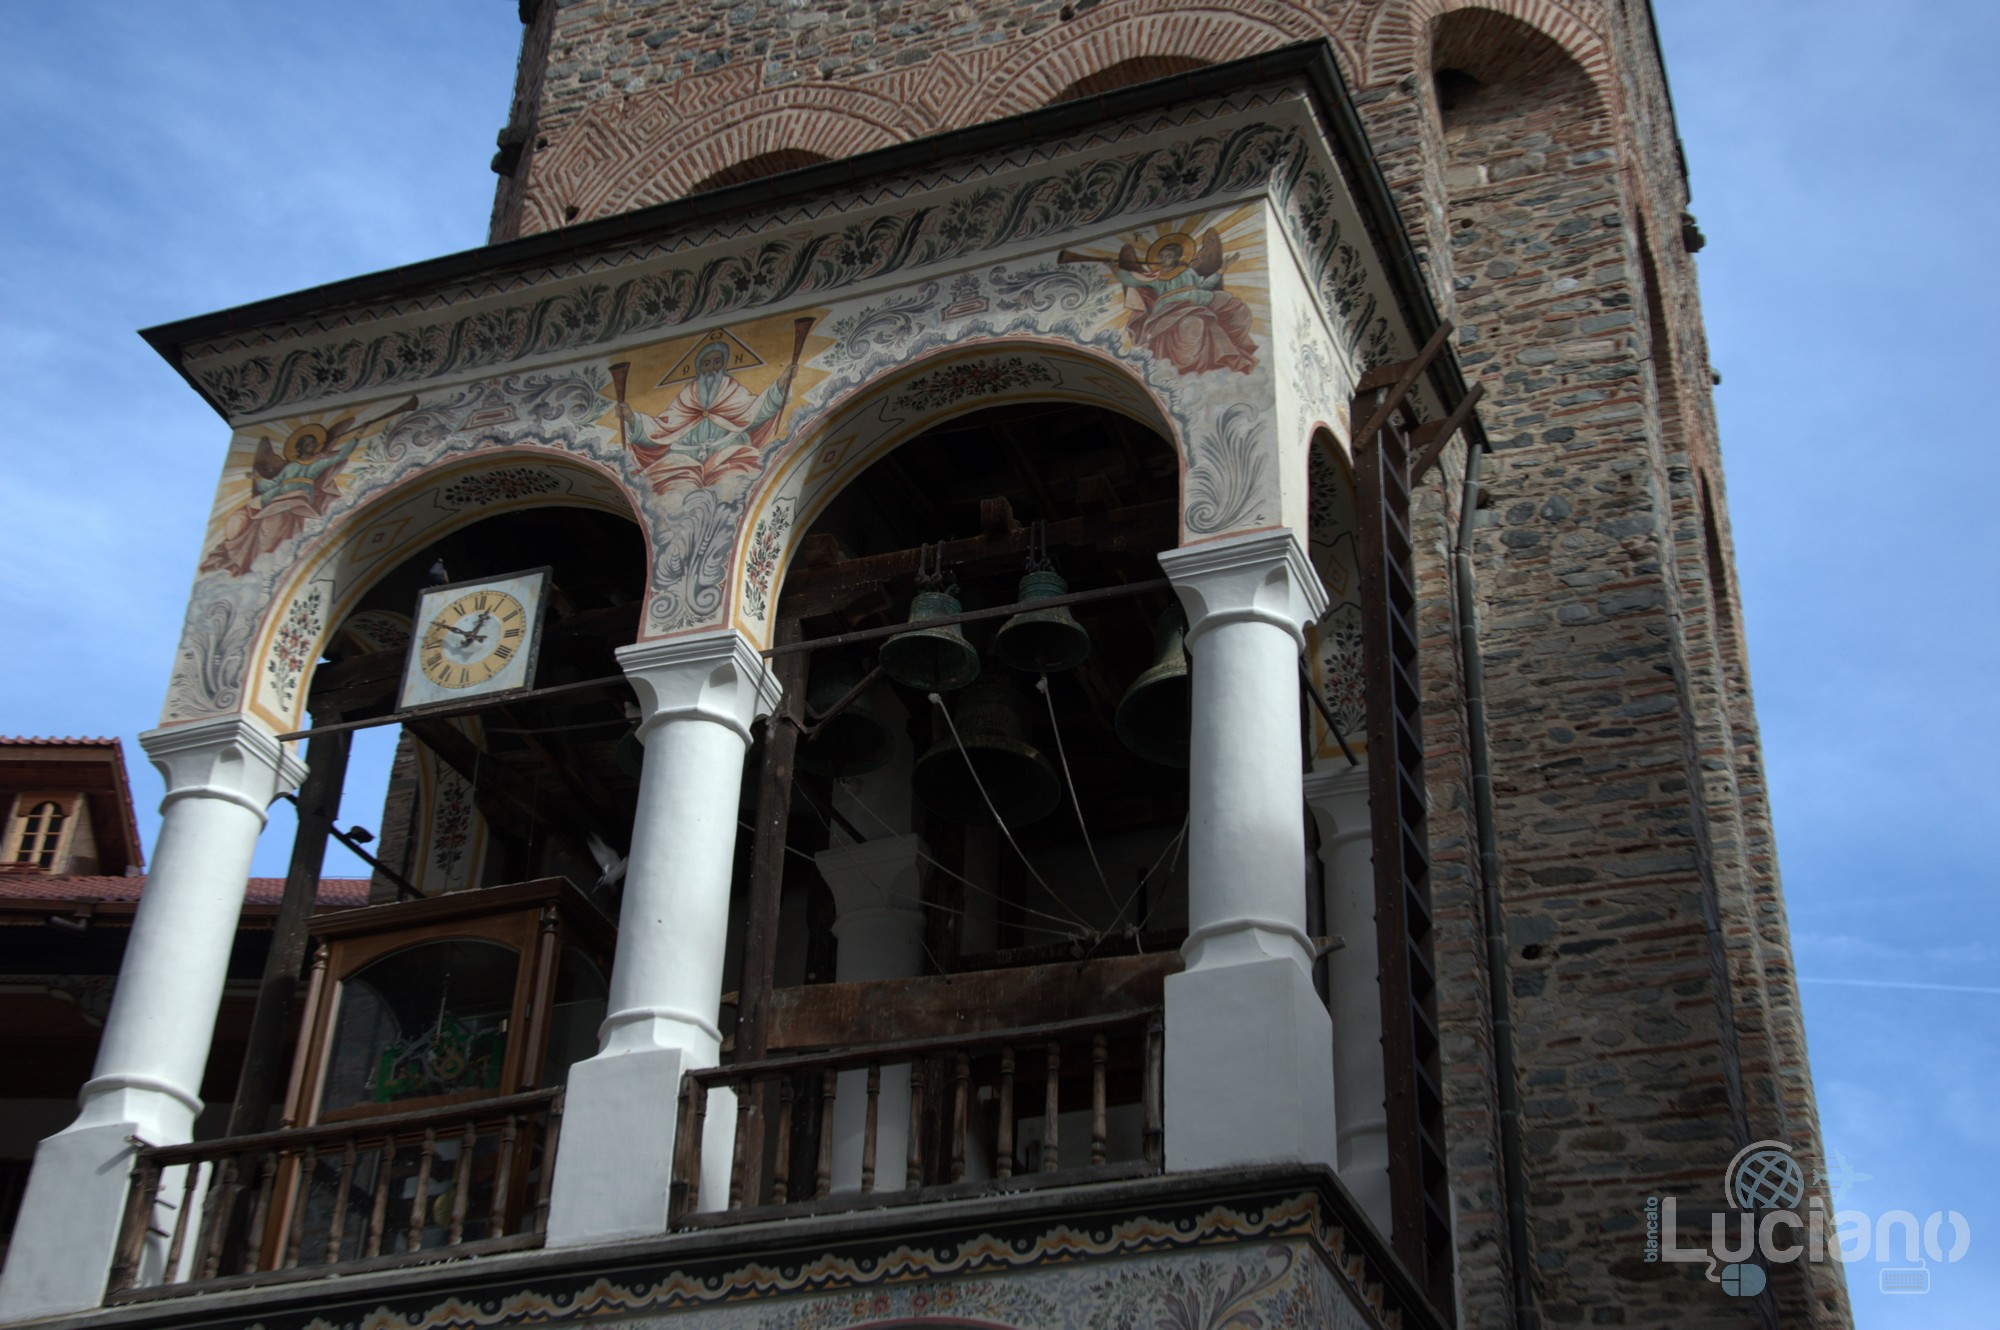 Vista interna - campanile - Monastero di Rila, Рилски Манастир, Rilski Manastir - Sofia - Bulgaria